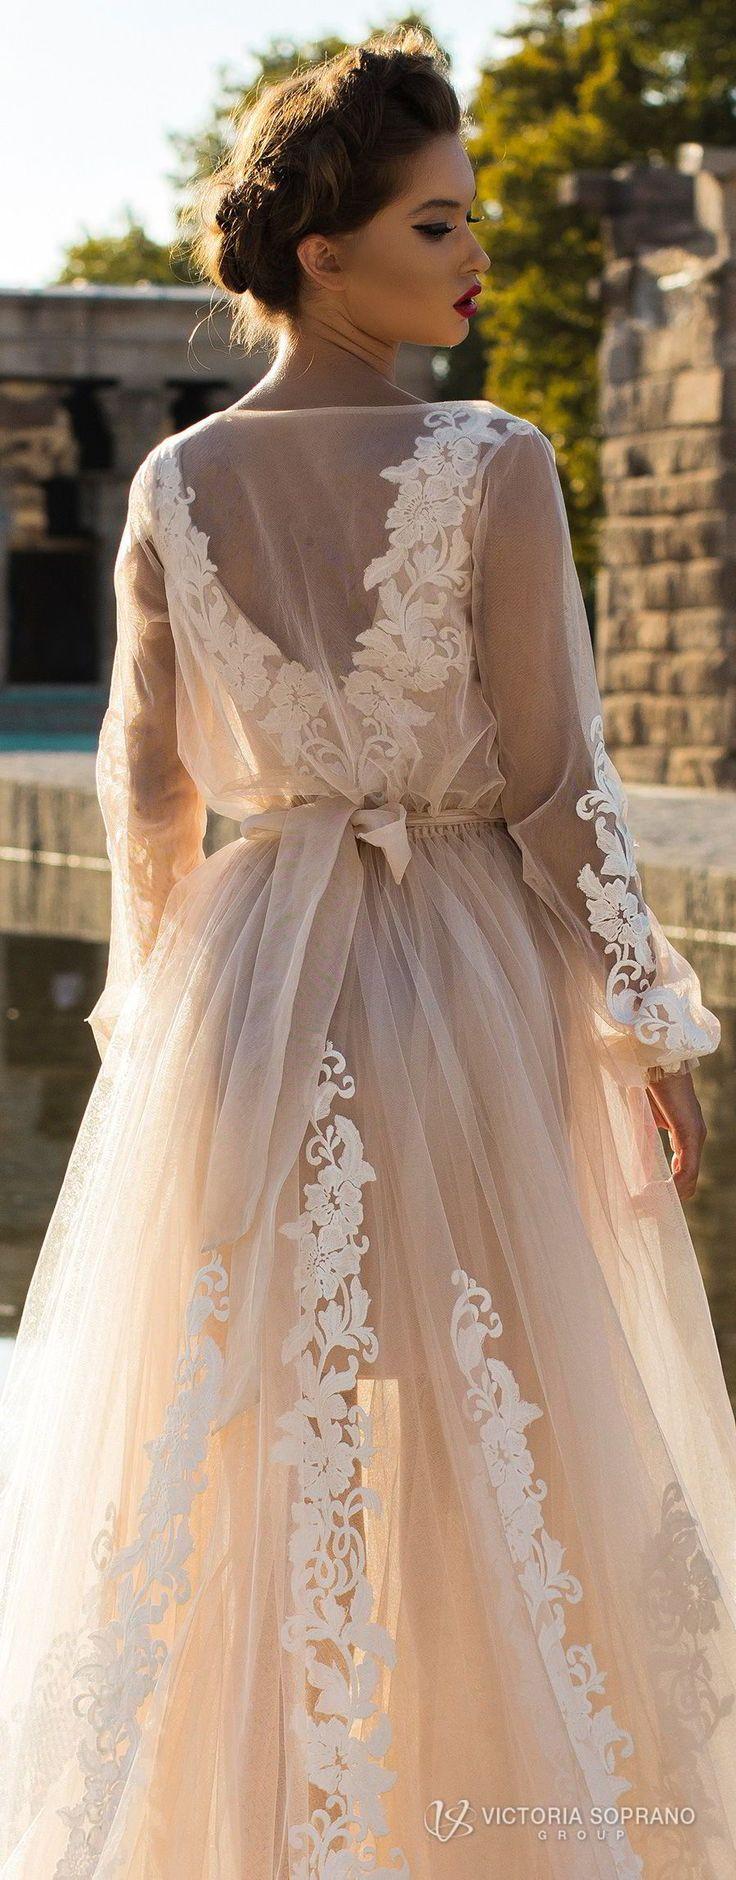 victoria soprano 2018 bridal long sleeves illuson bateau v neck light embellishment romantic blush color a line wedding dress sheer back sweep train (leila) zbv #weddingdress